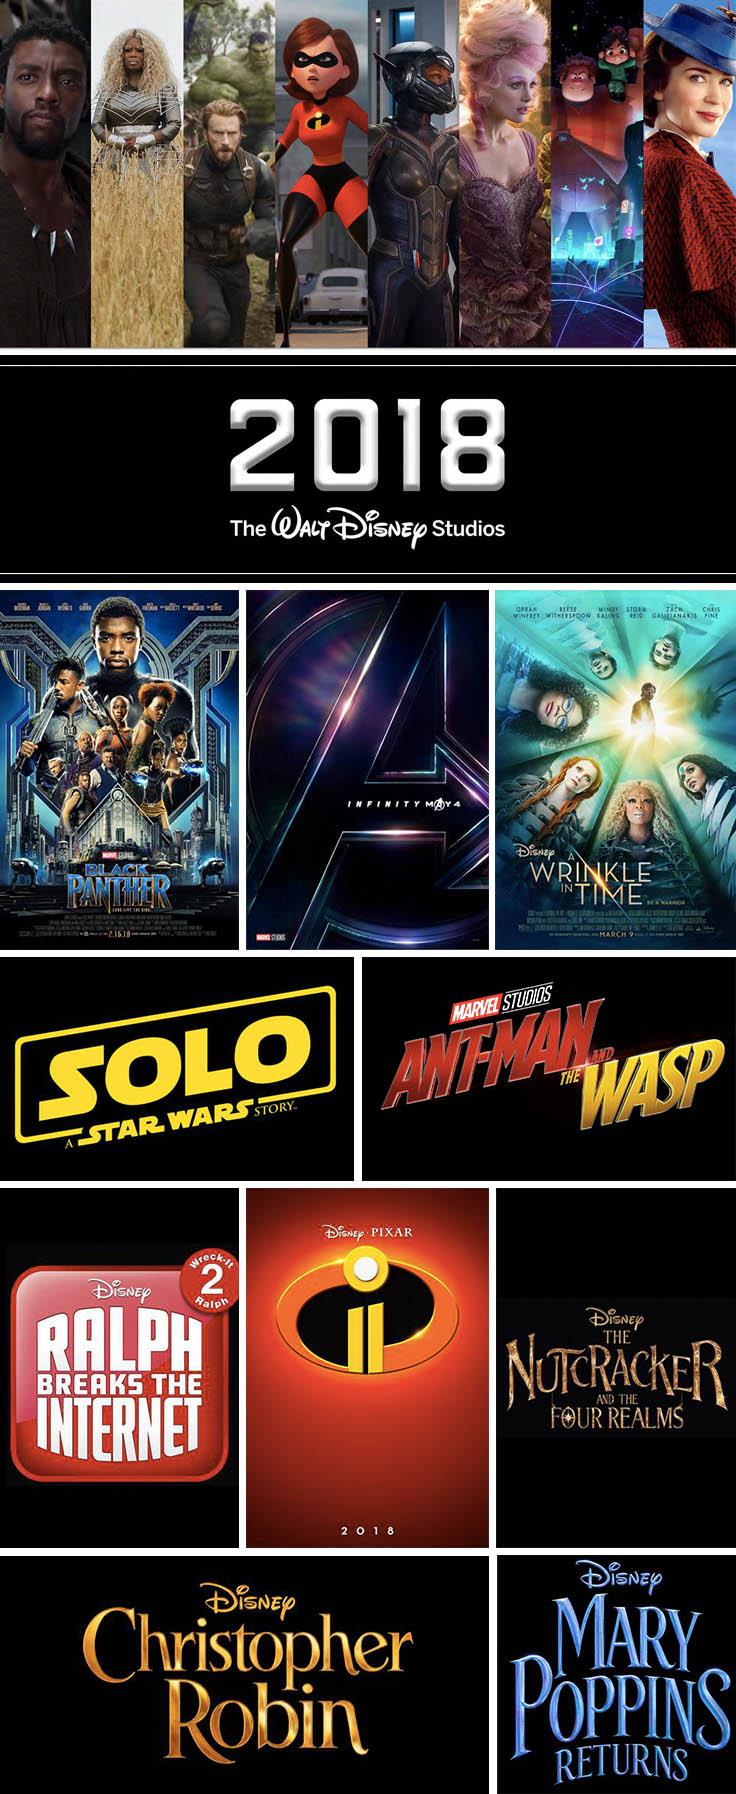 2018 Disney Movies + Marvel, LucasFilm, and Pixar Motion ...